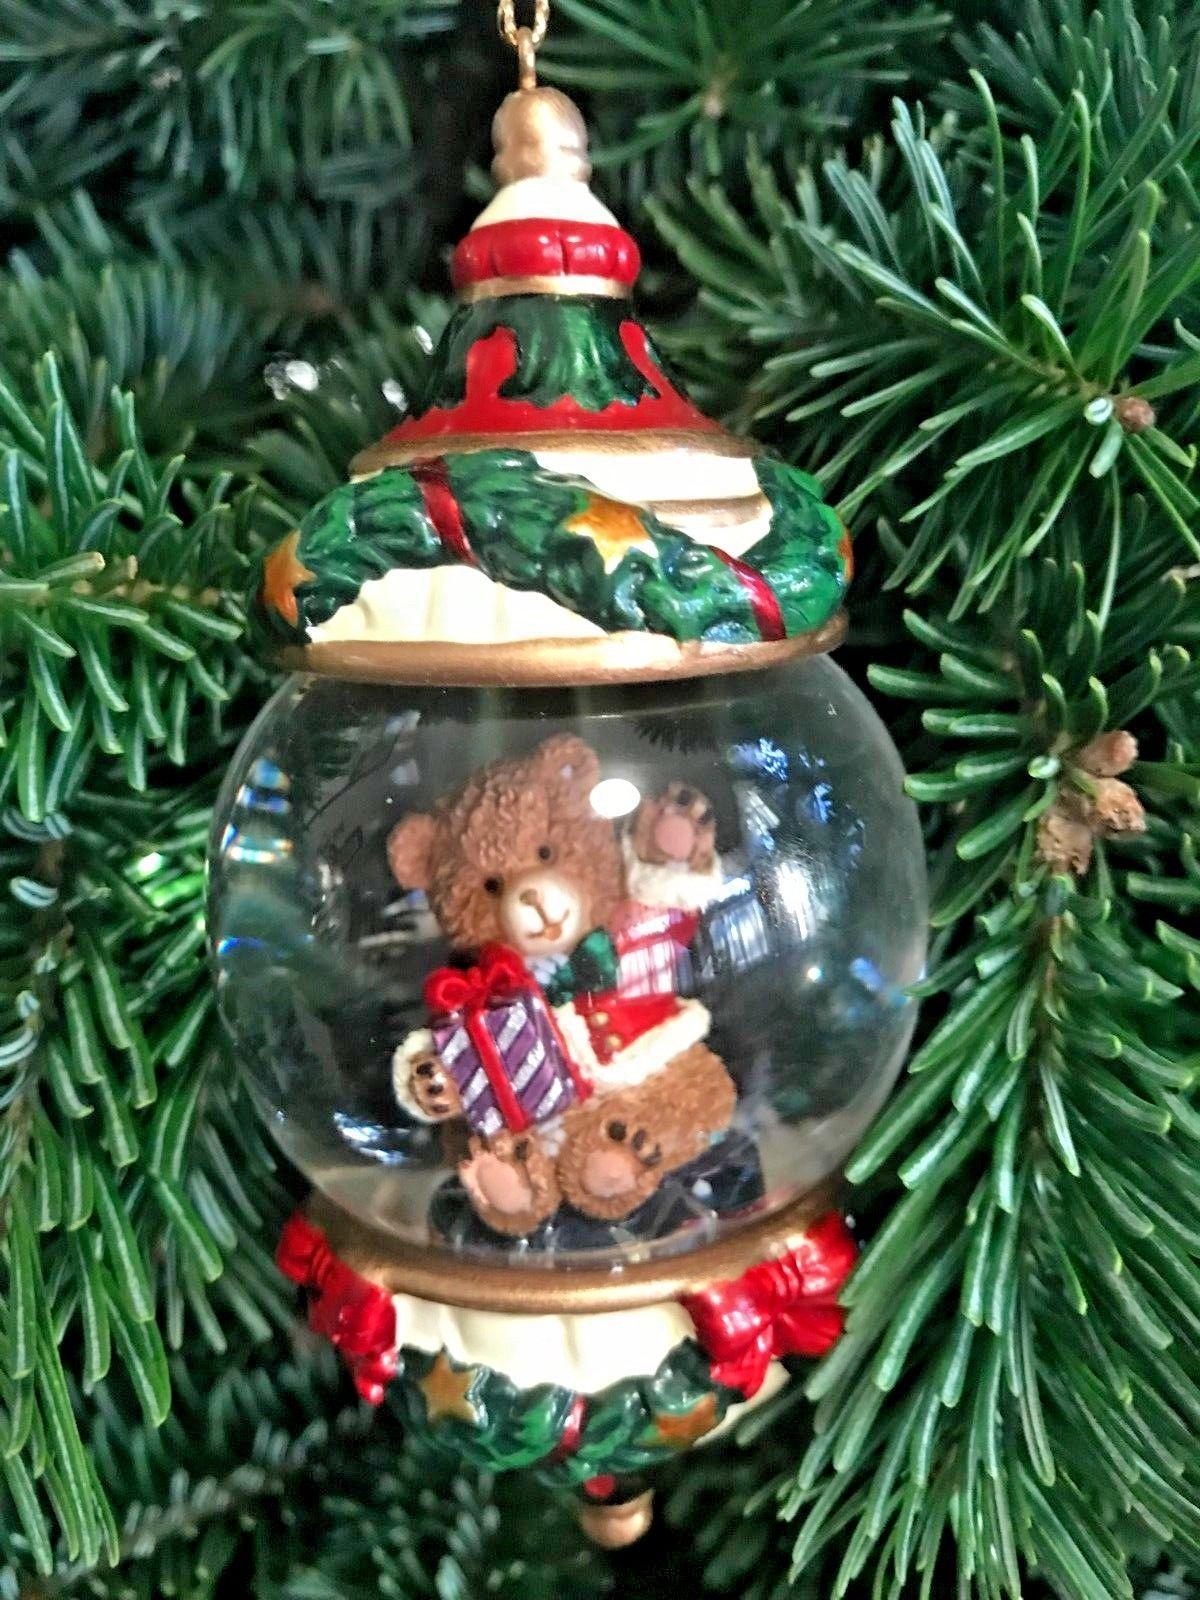 Costco Kirkland Signature Water Snow Globe Ornament Christmas Tree Glass Ebay Globe Ornament Christmas Tree Ornaments Christmas Ornaments